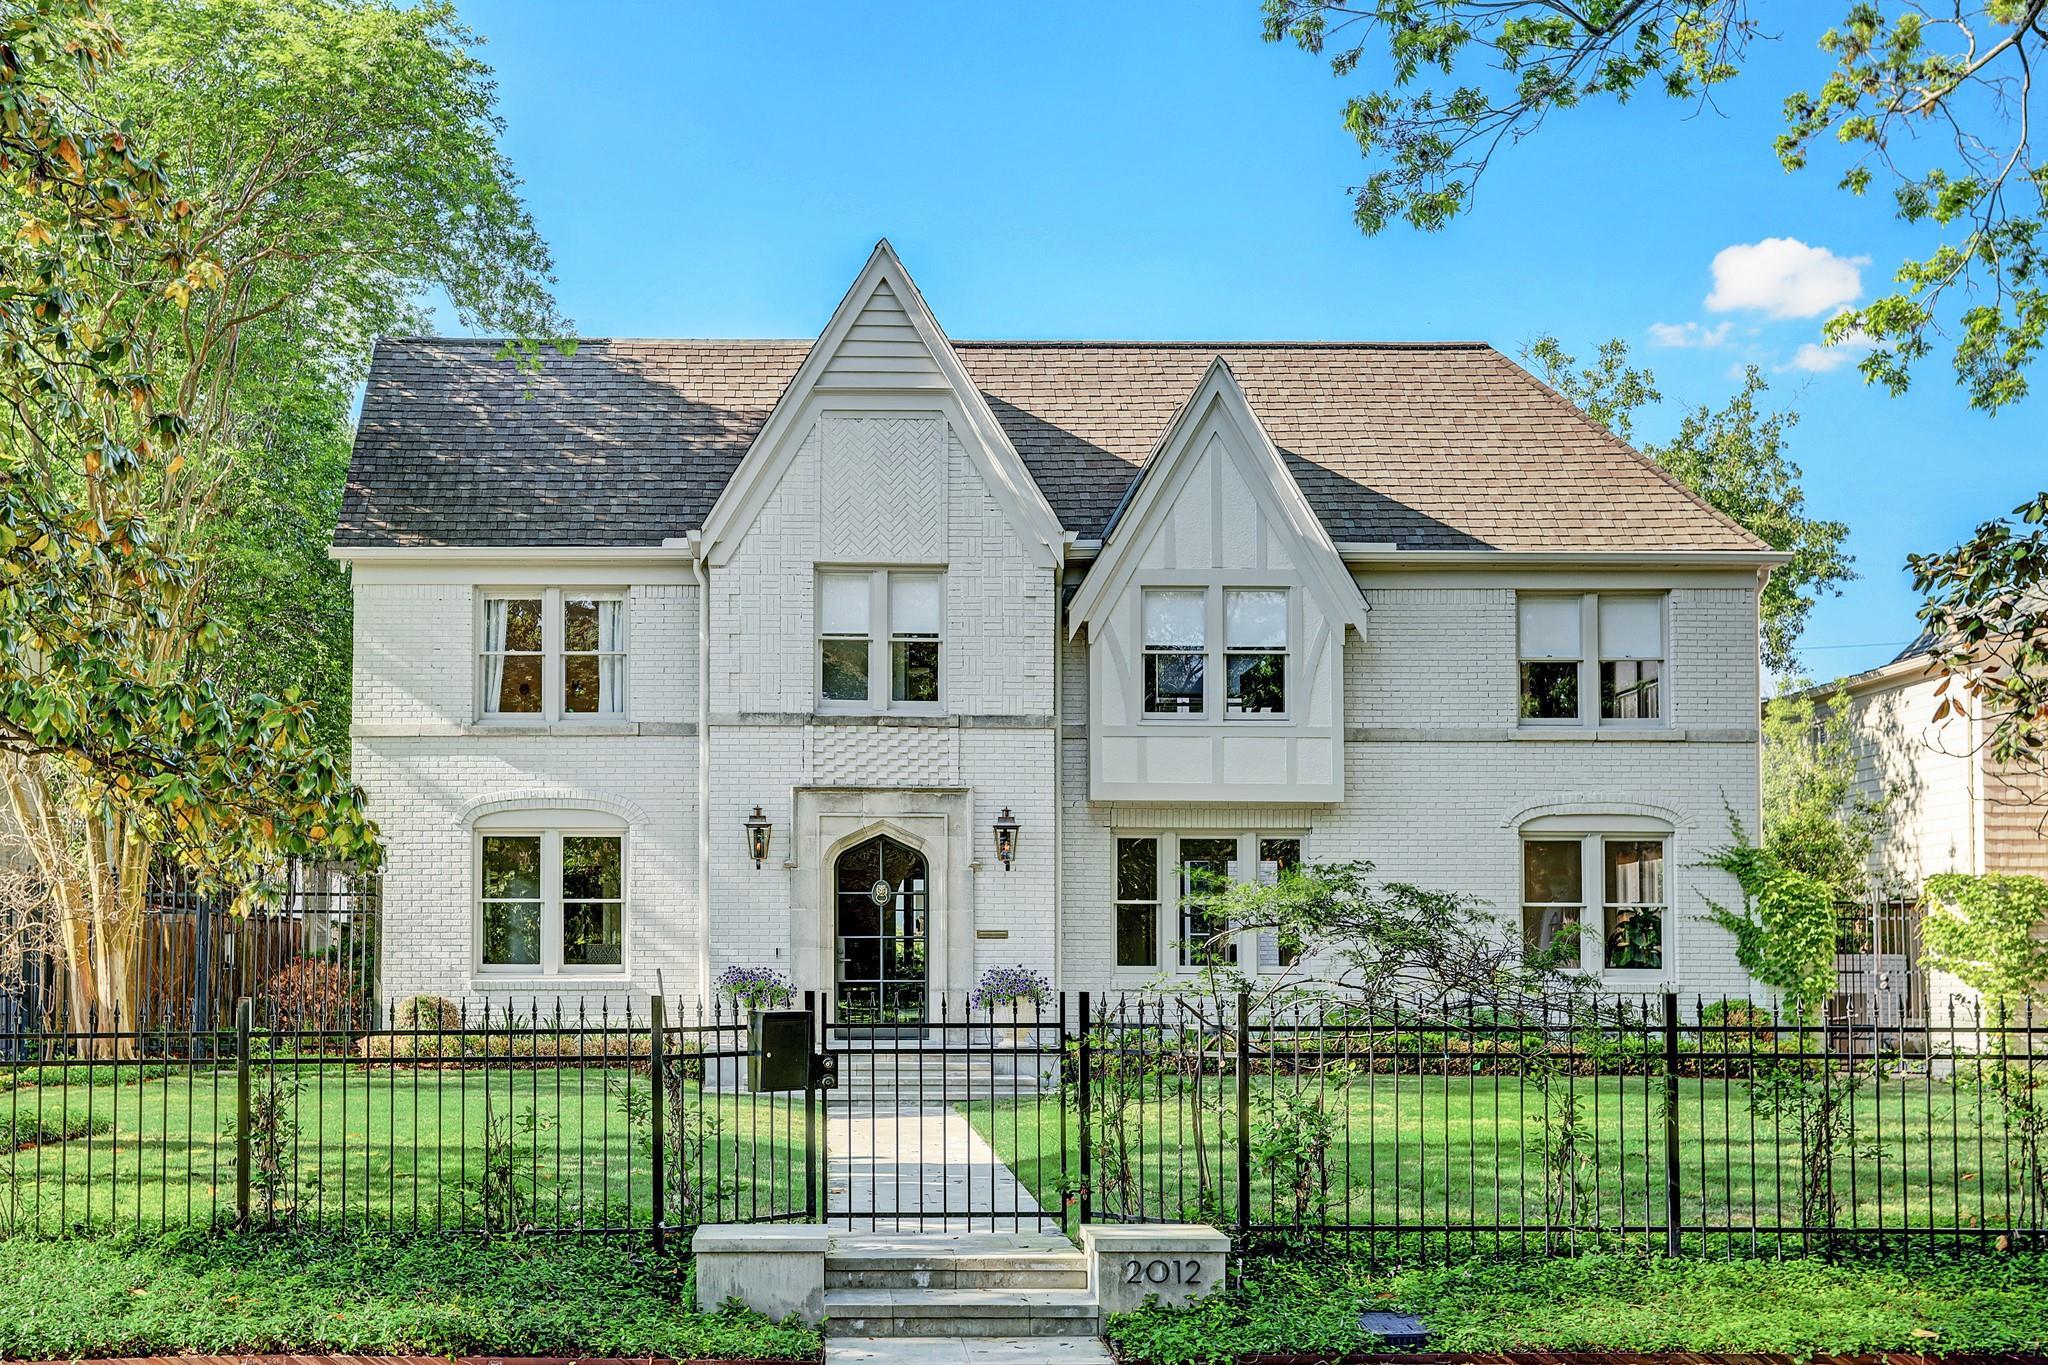 2012 Sunset Property Photo - Houston, TX real estate listing